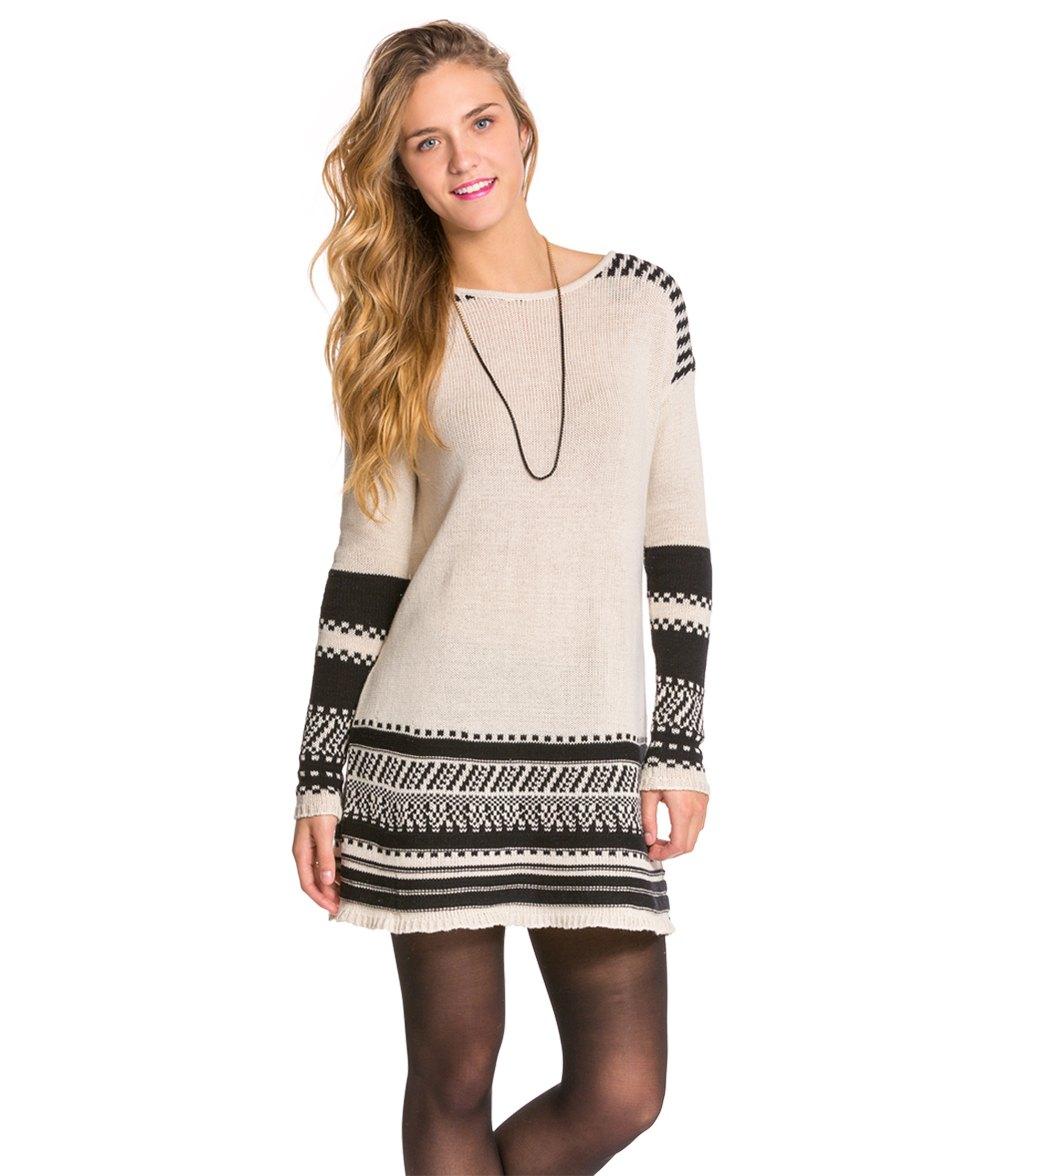 dfa2e405836 Volcom Dark Water Sweater Dress at SwimOutlet.com - Free Shipping